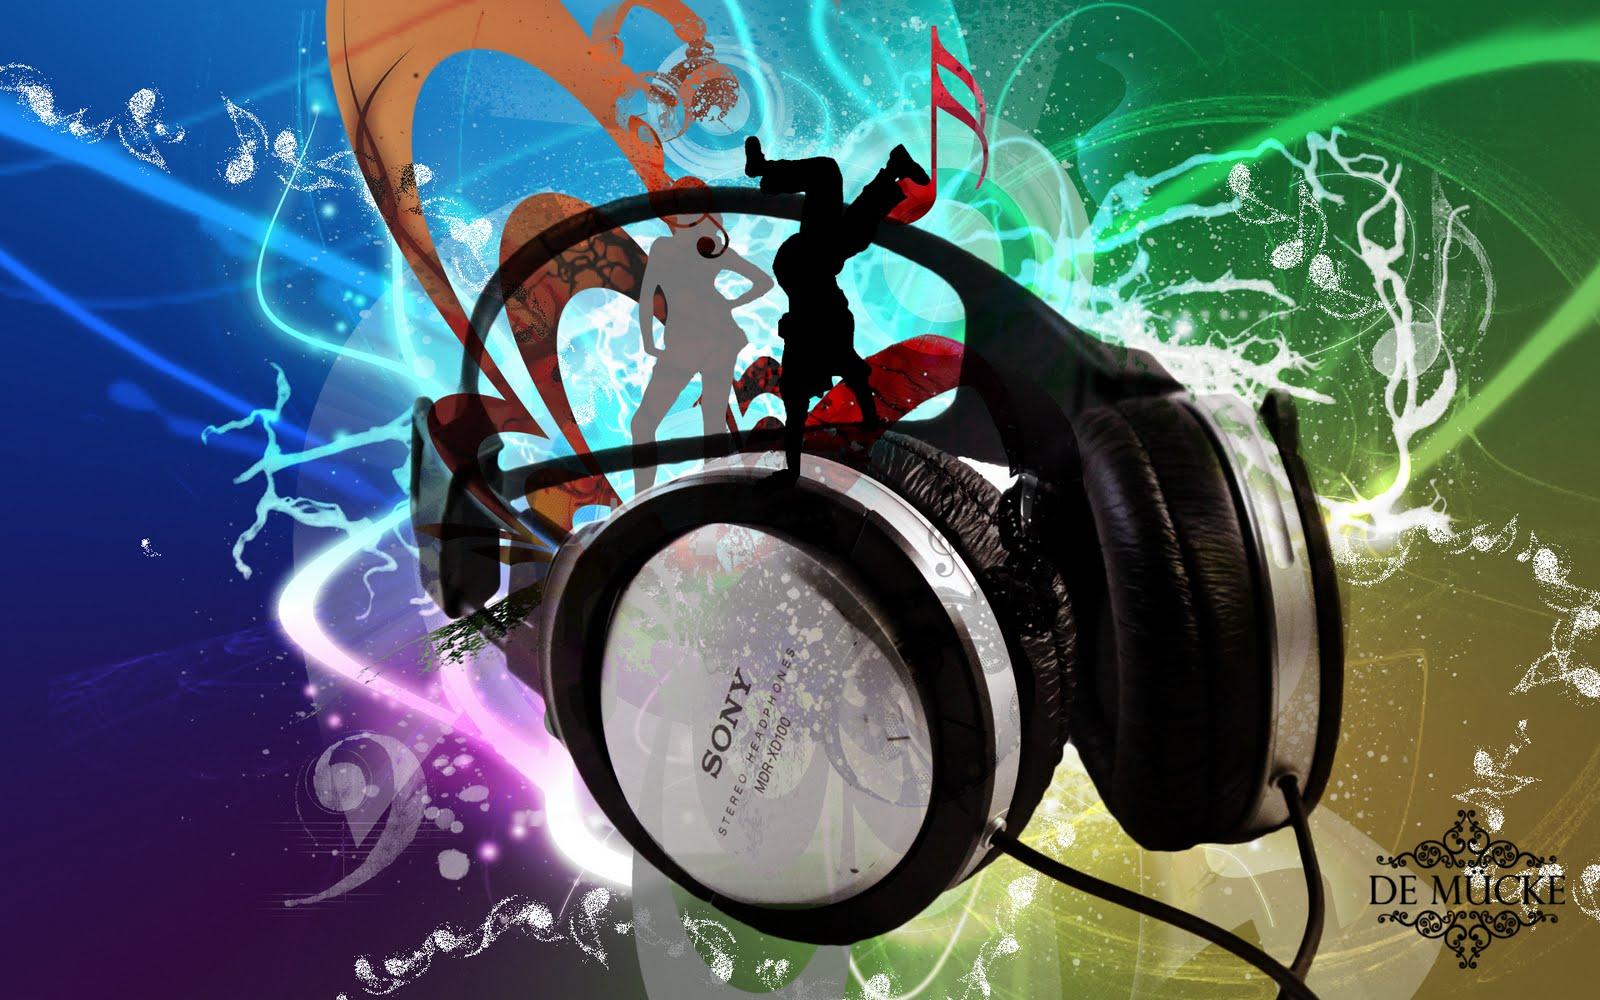 music wallpaper hd,headphones,audio equipment,gadget,graphic design,personal protective equipment